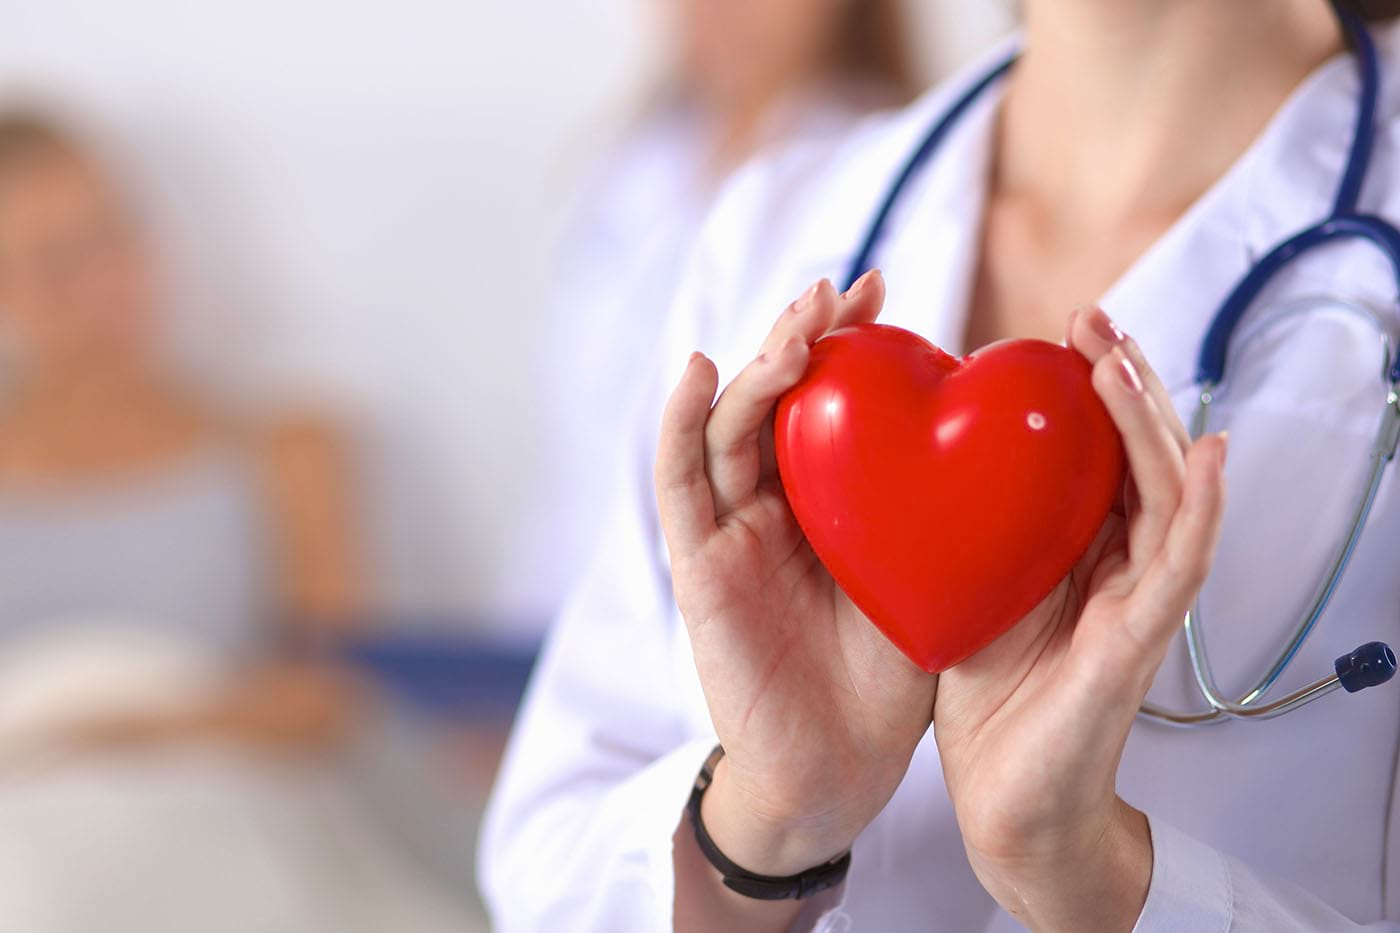 Bolile cardiovasculare la femei, prevalență mare la nivel mondial